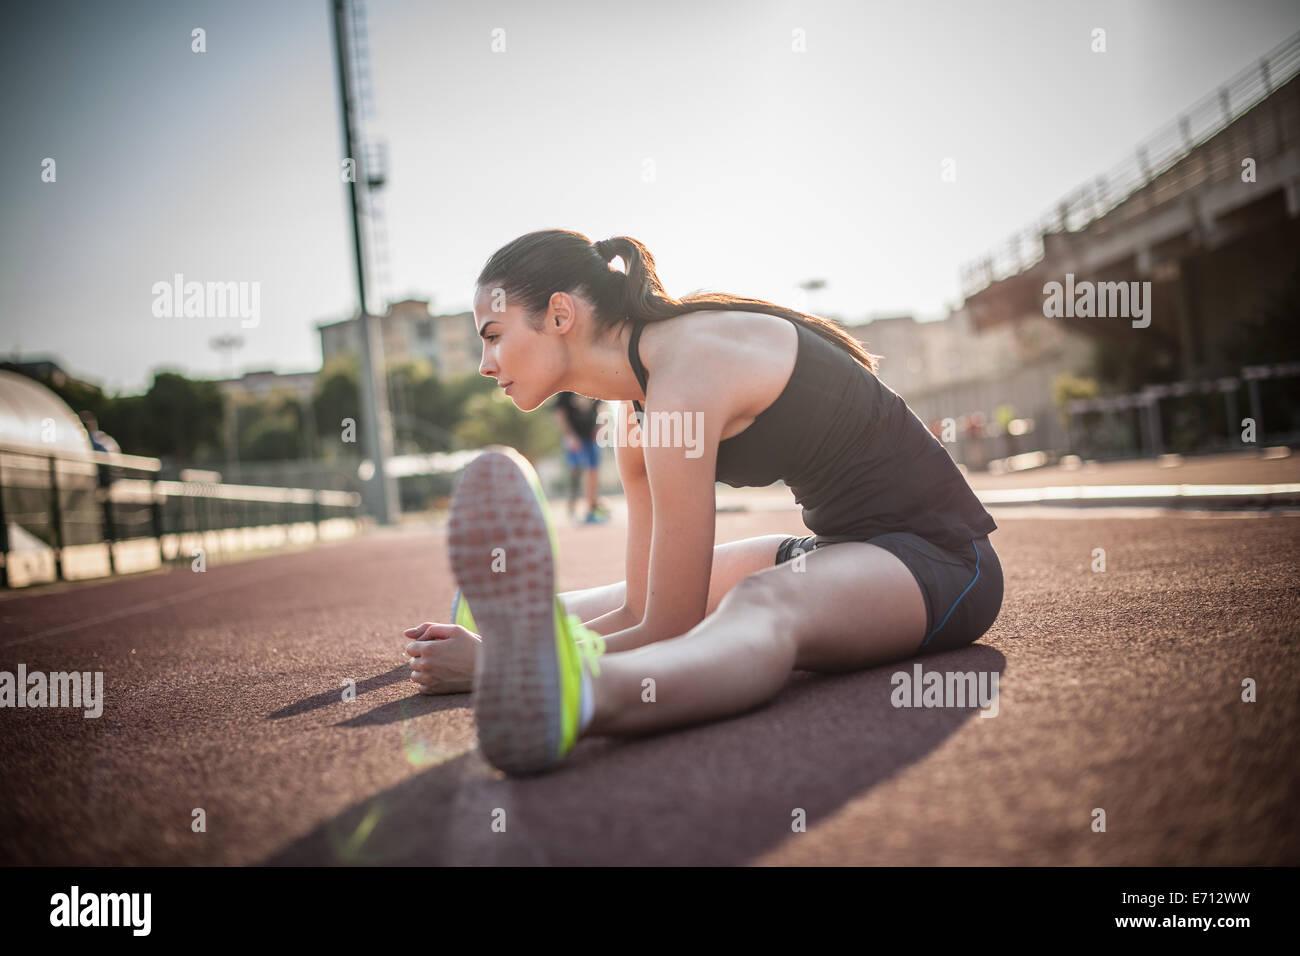 Donna seduta sul pavimento gambe stretching Immagini Stock